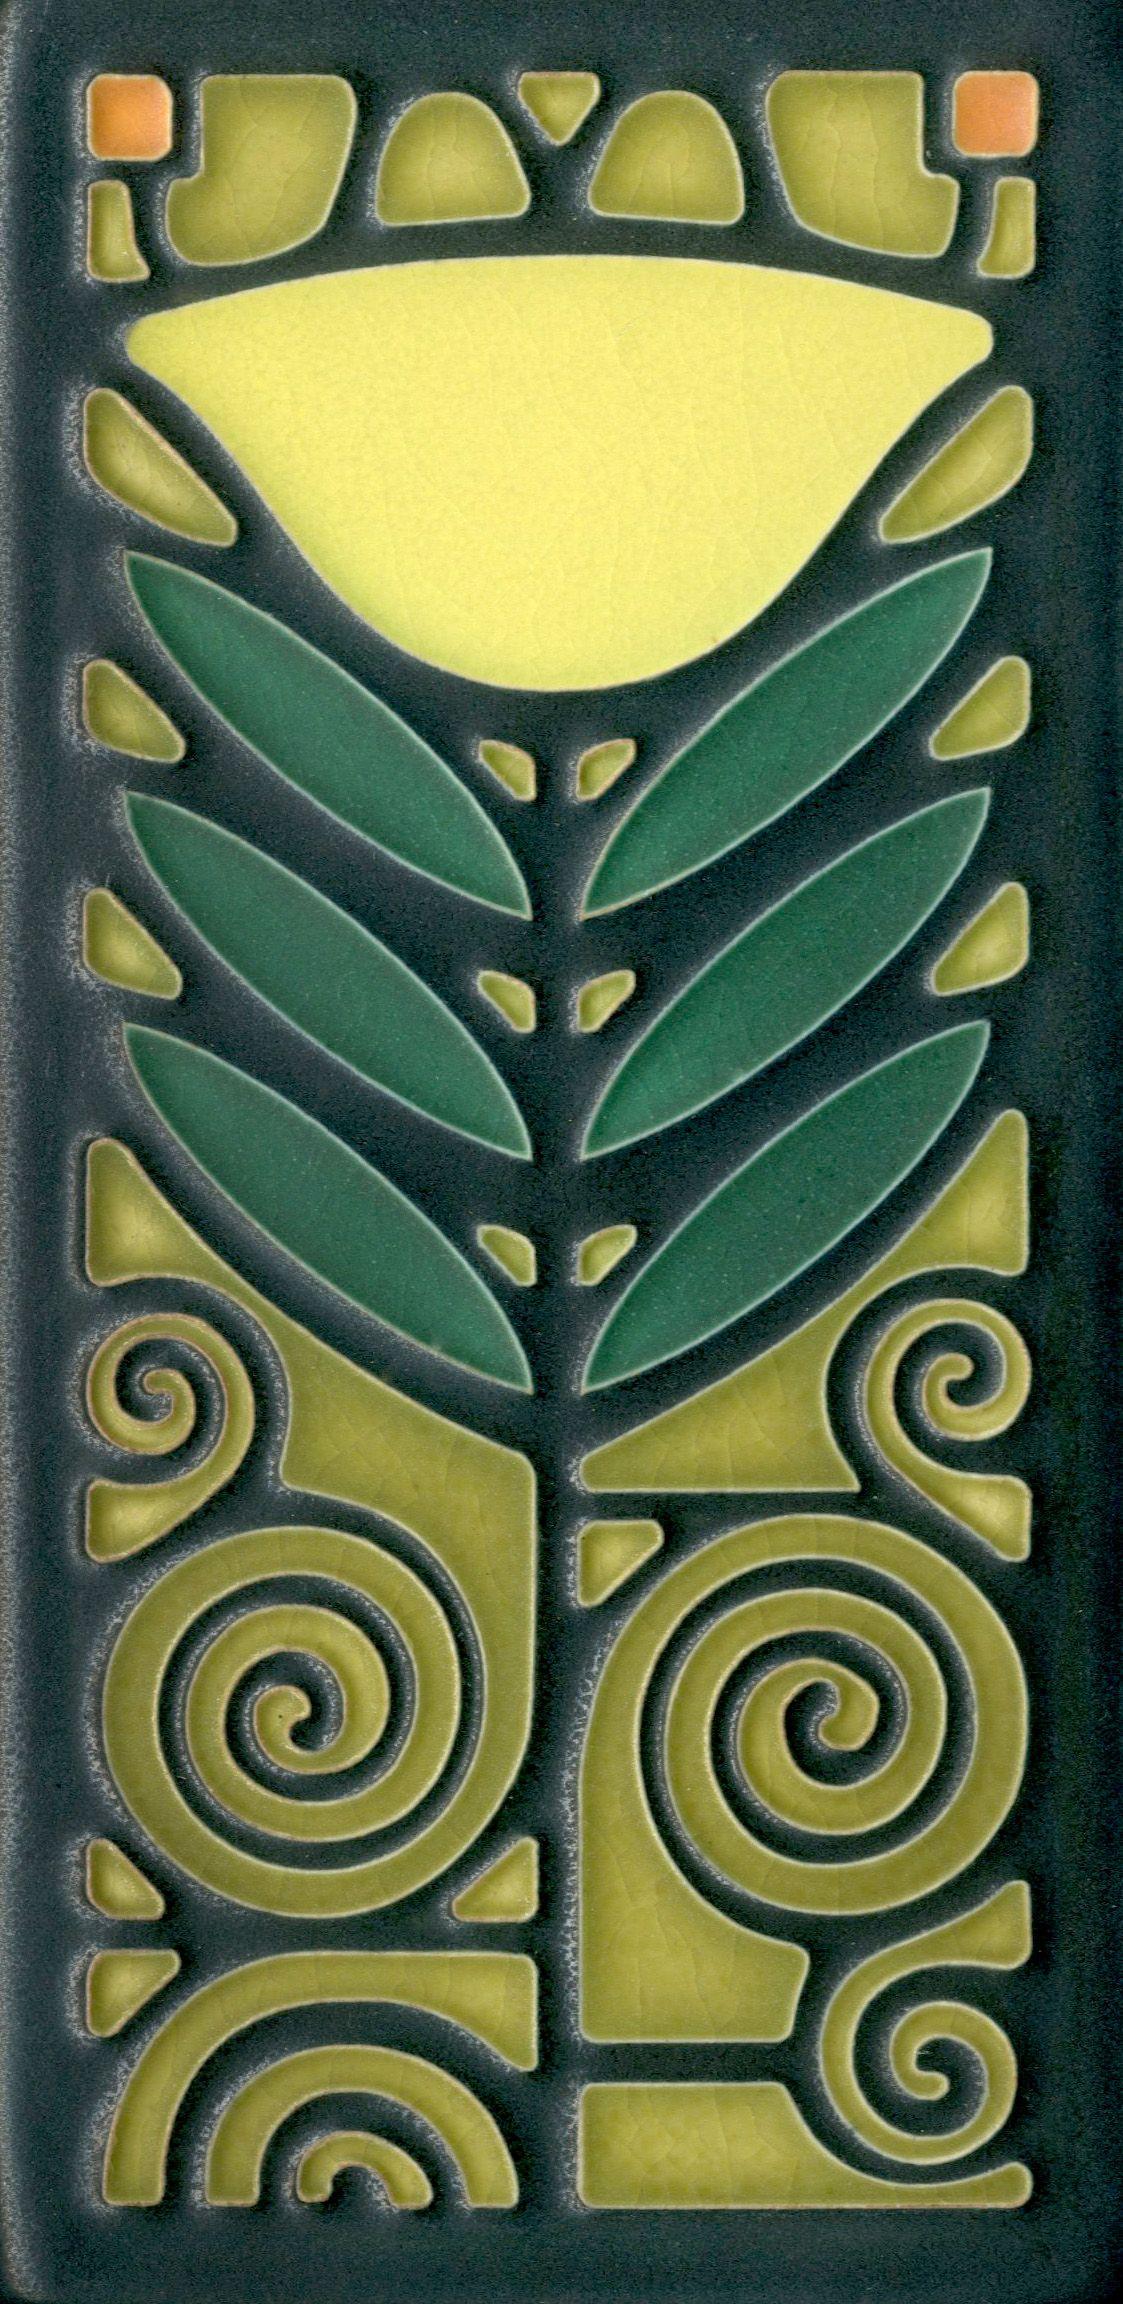 Motawi Tileworks | Distinctive American Art Tiles